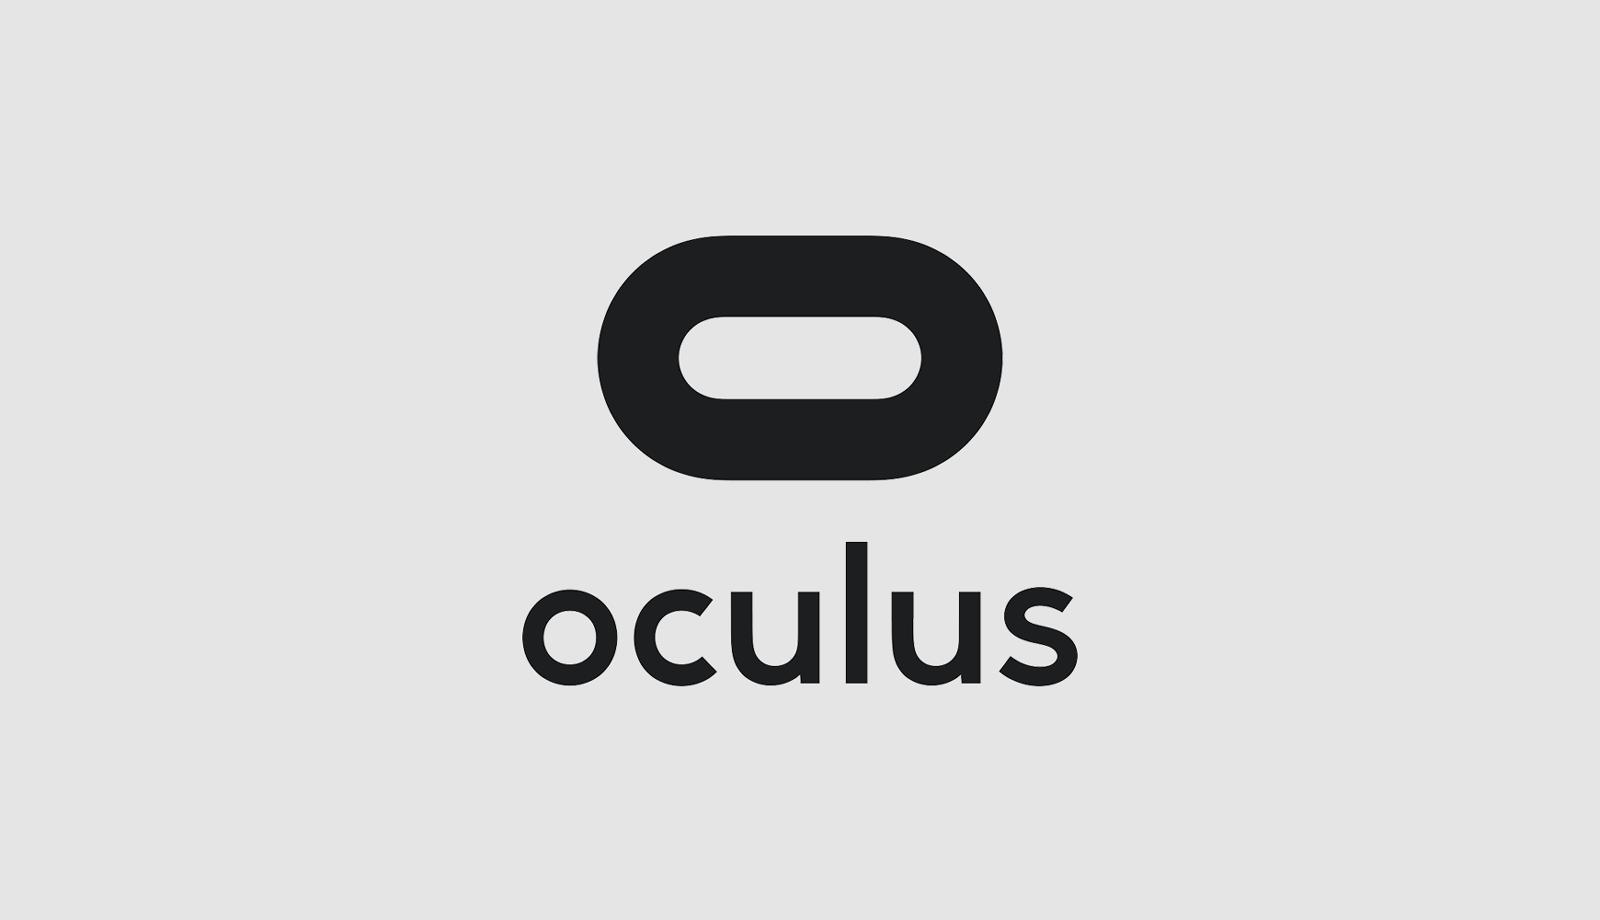 oculus_img_1.png